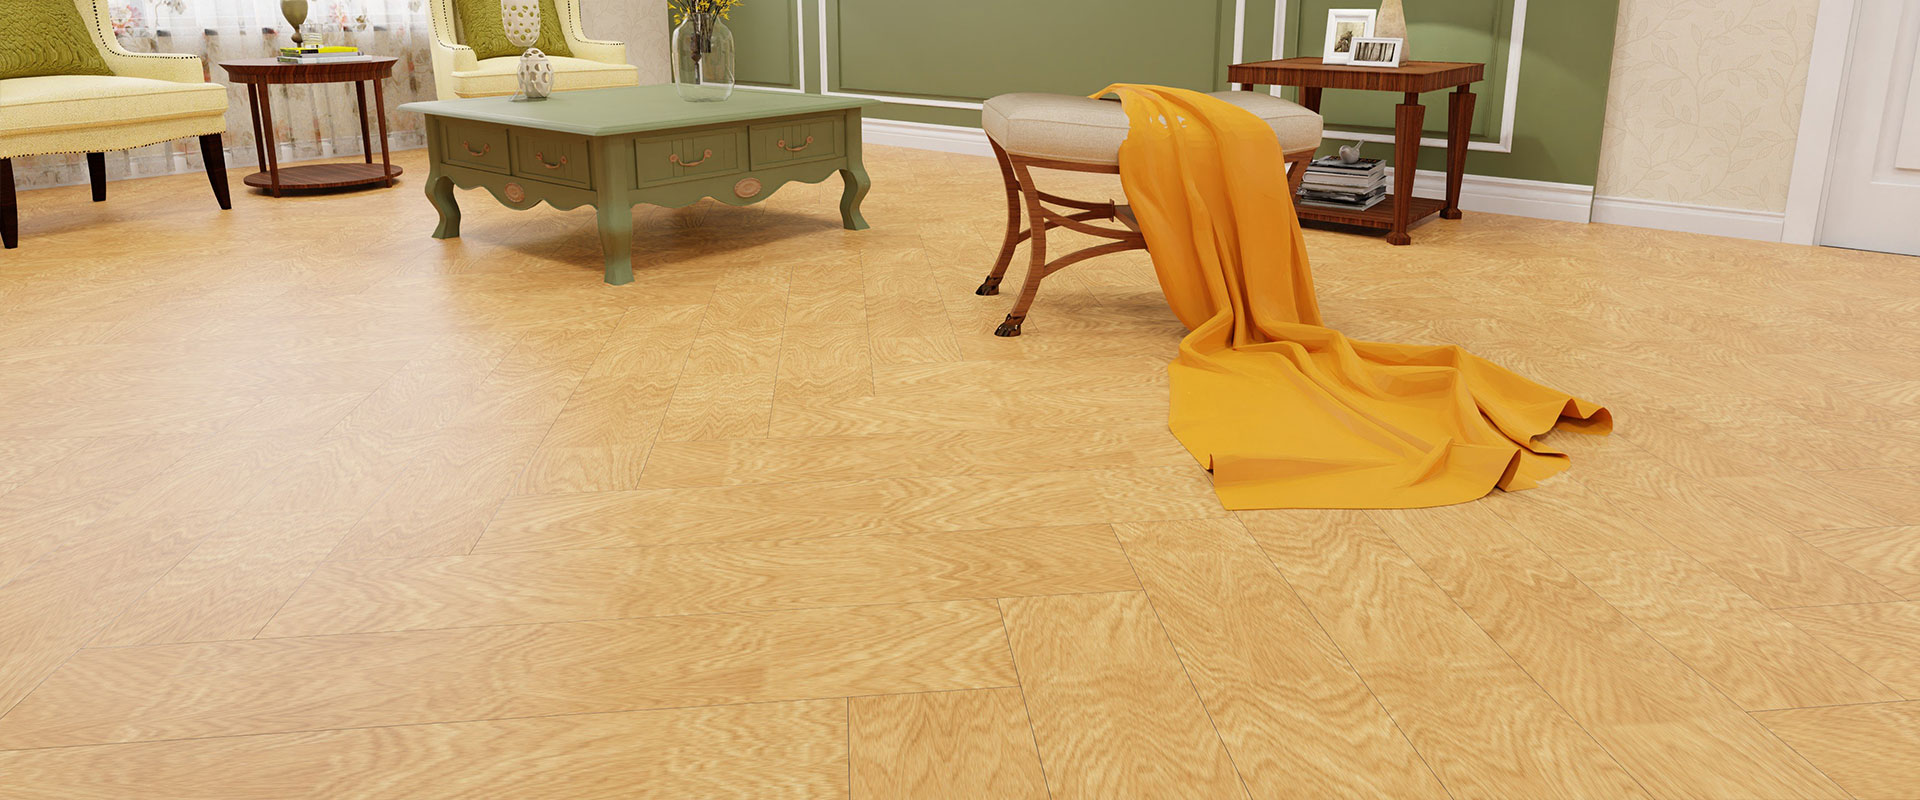 banner-legno-8504